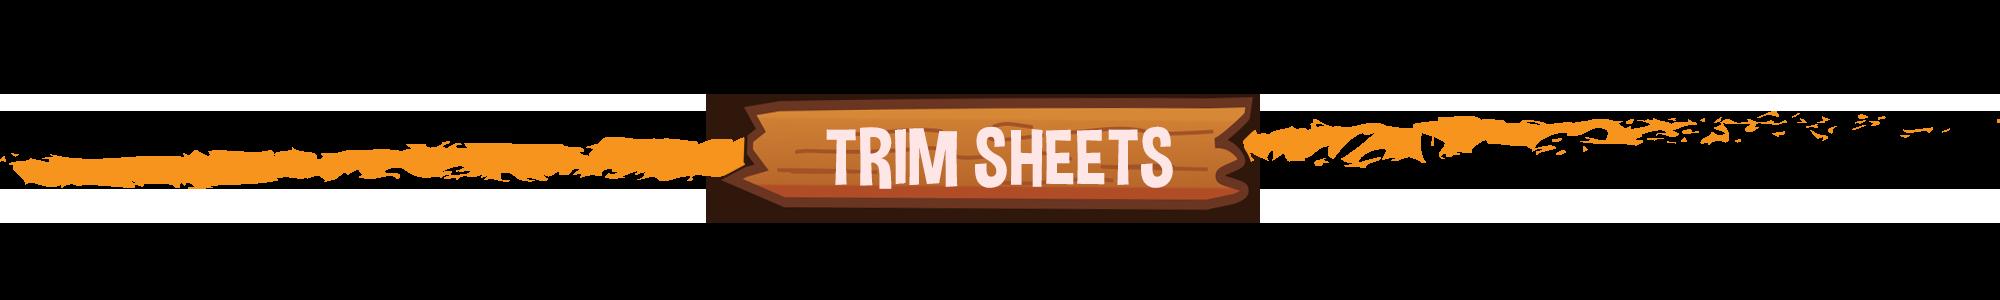 Trim Sheets